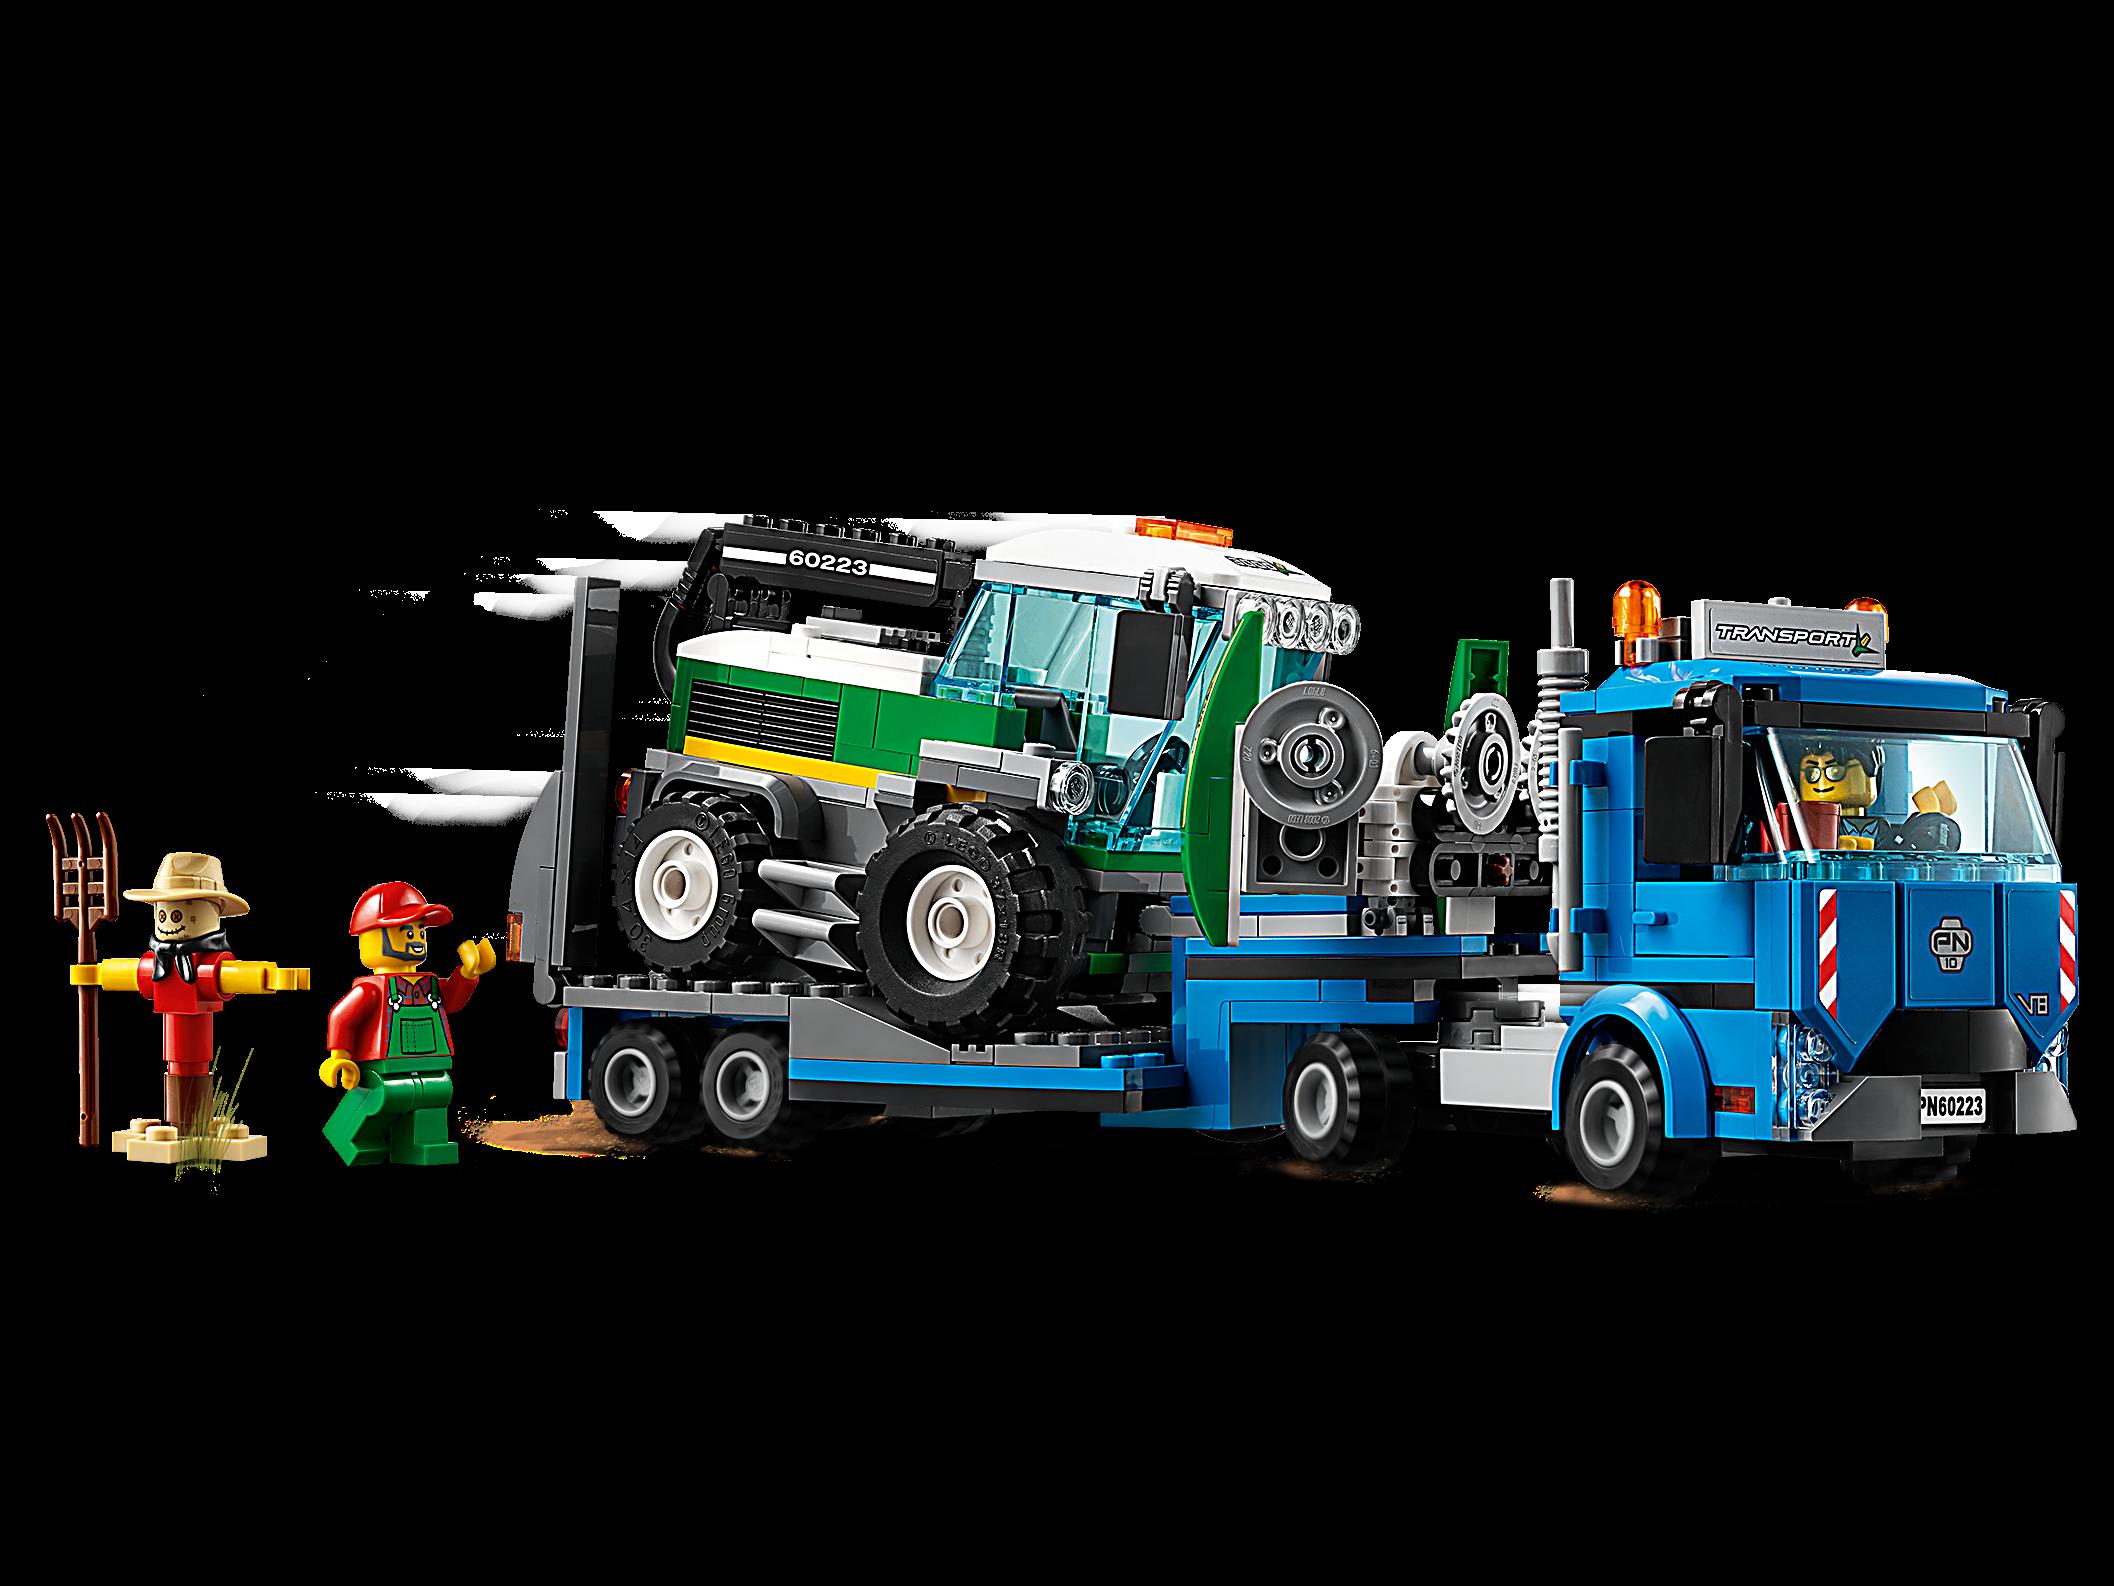 Harvester Transport 60223 City Buy Online At The Official Lego Shop Sg